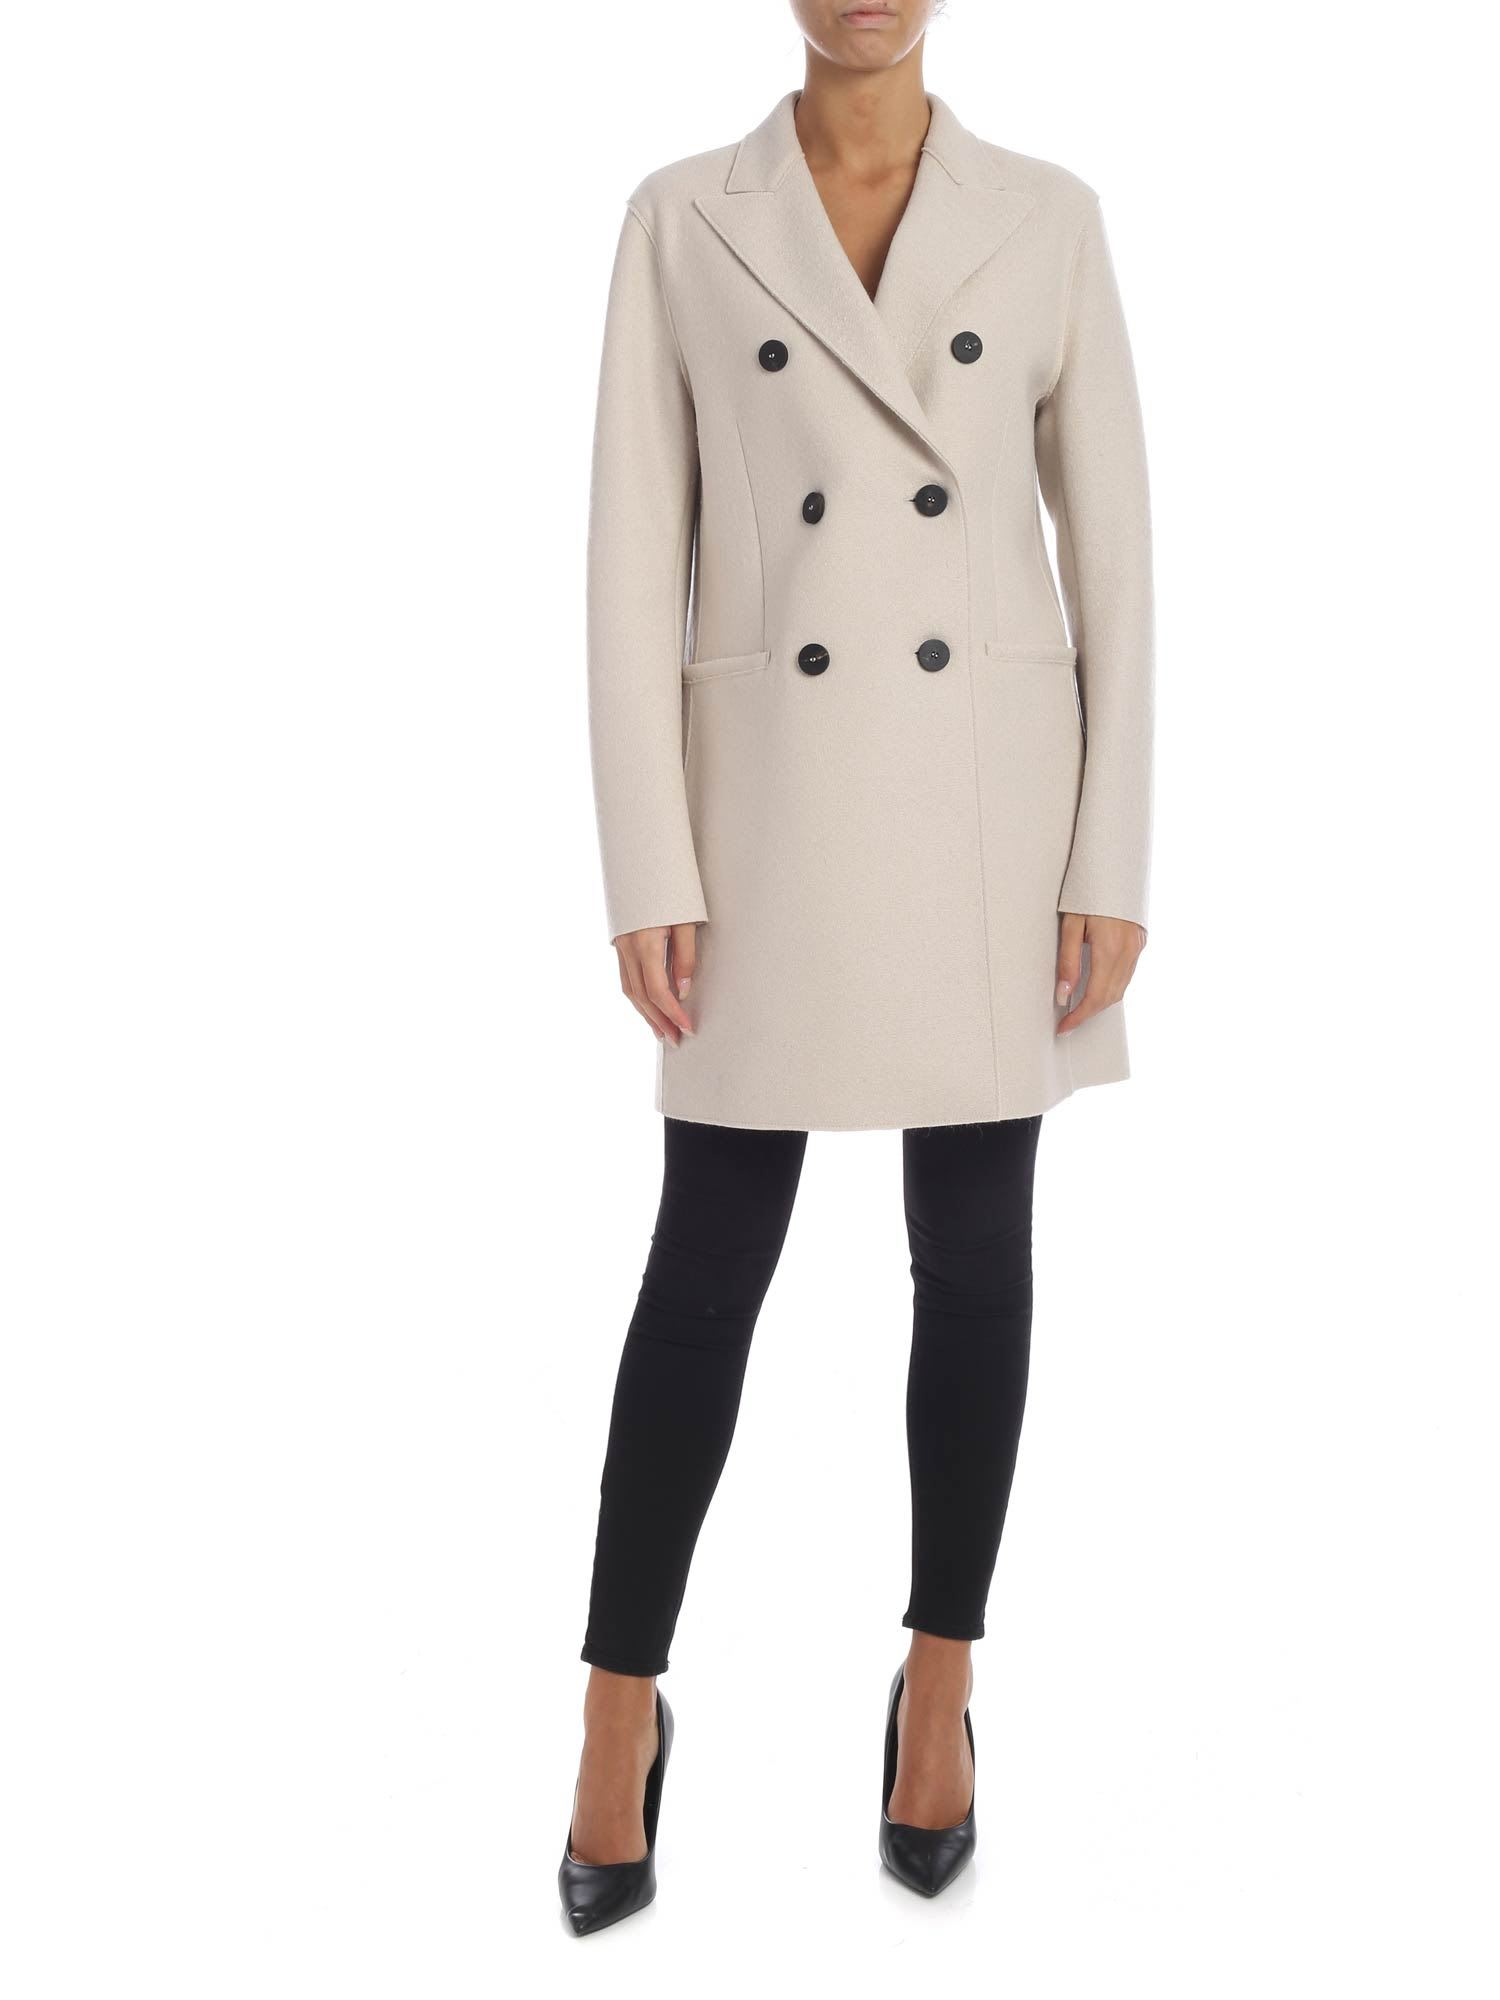 Harris Wharf London – Woolen Cloth Coat